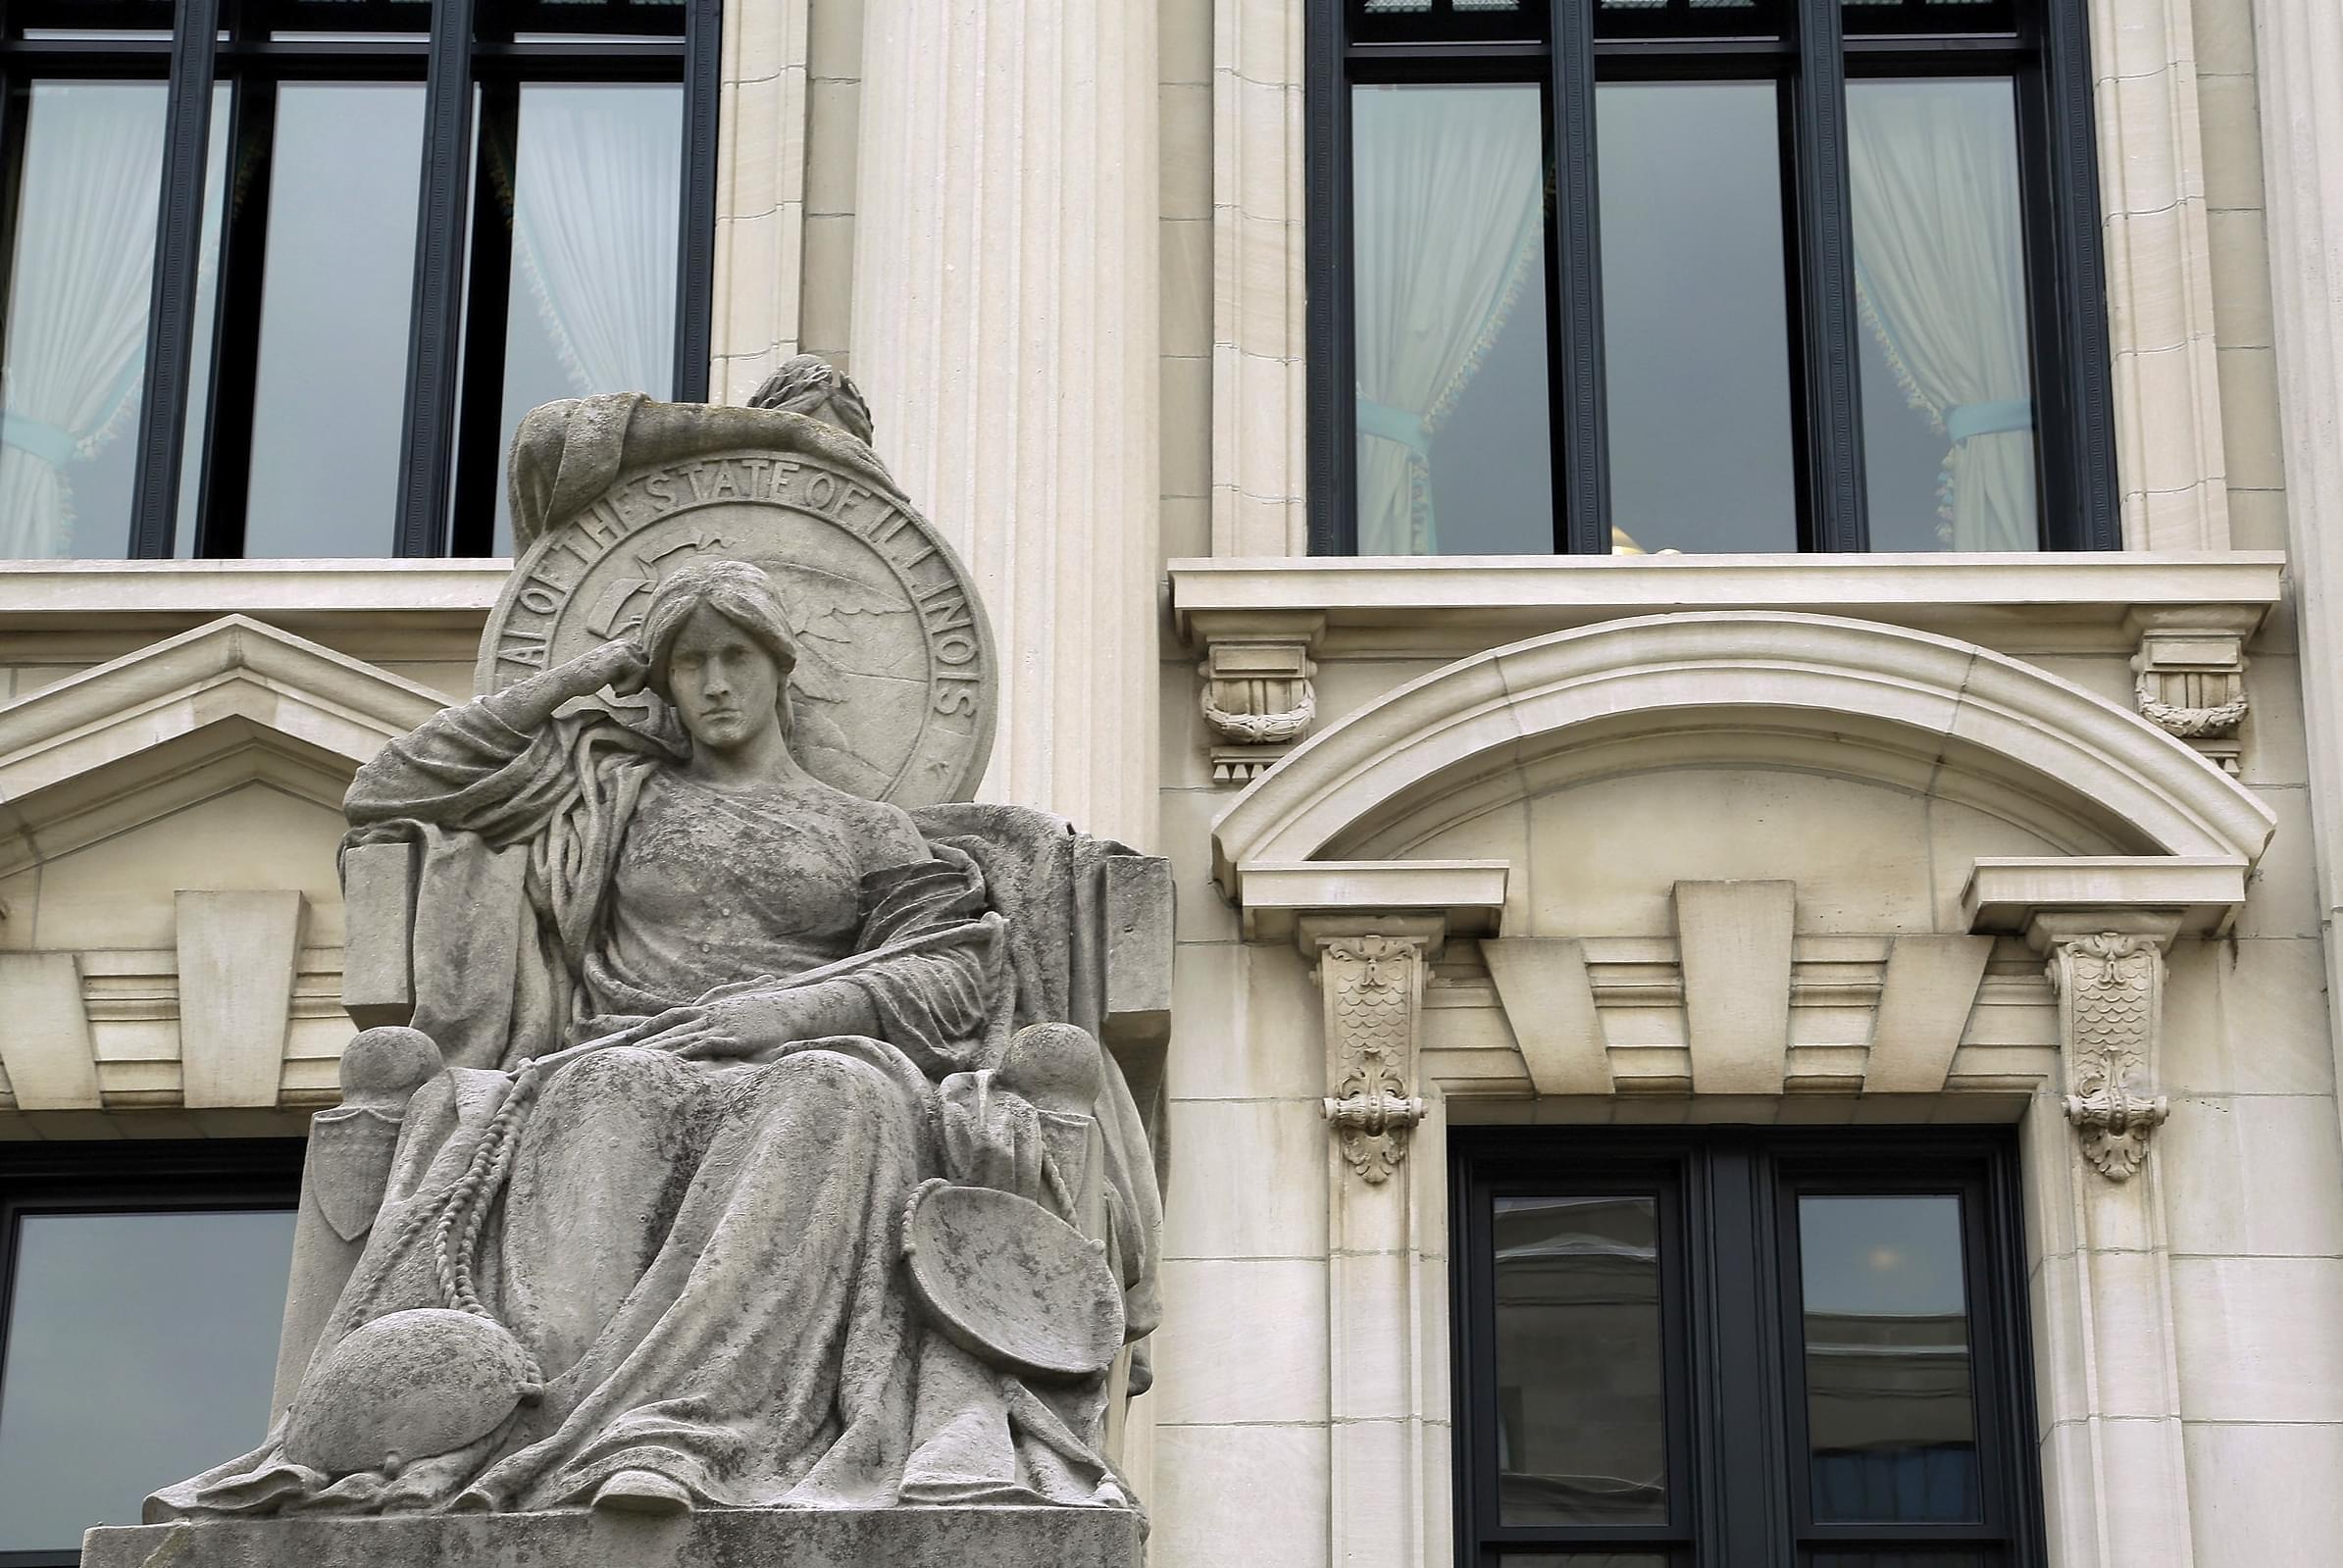 Statues outside the Illinois Supreme Court building